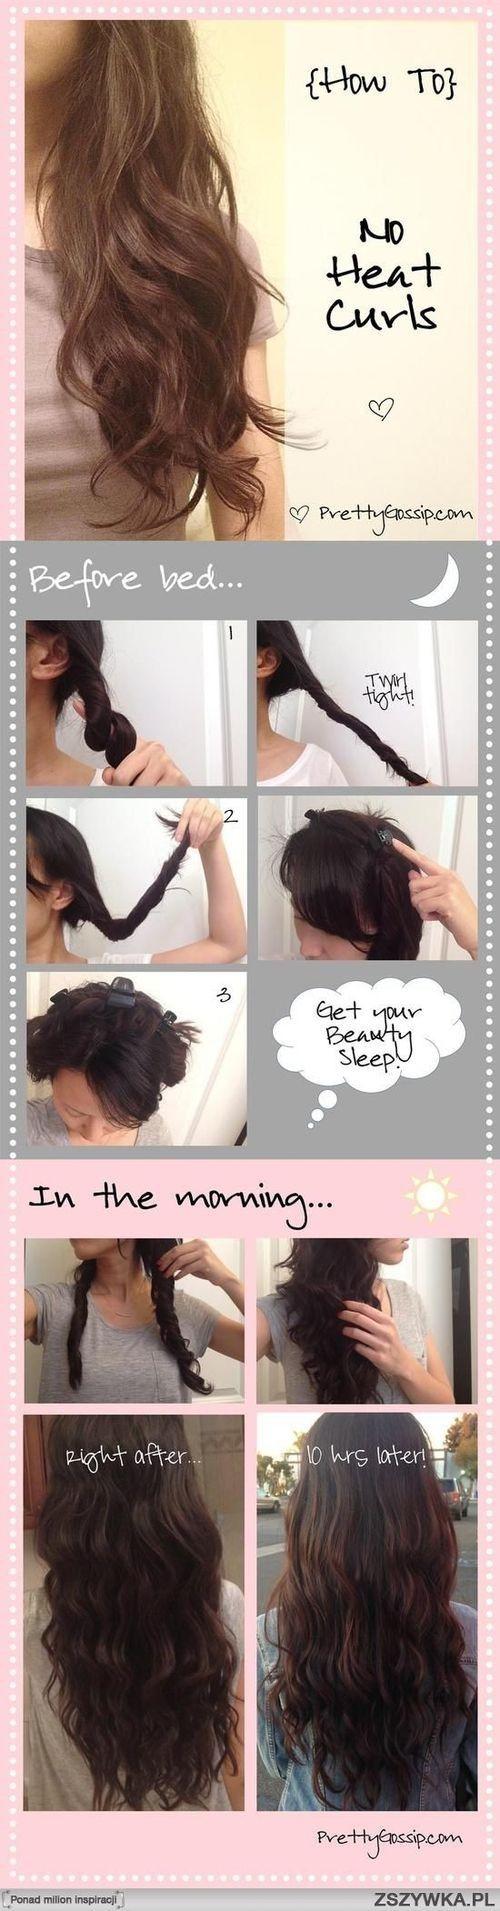 (How to) No heat curls